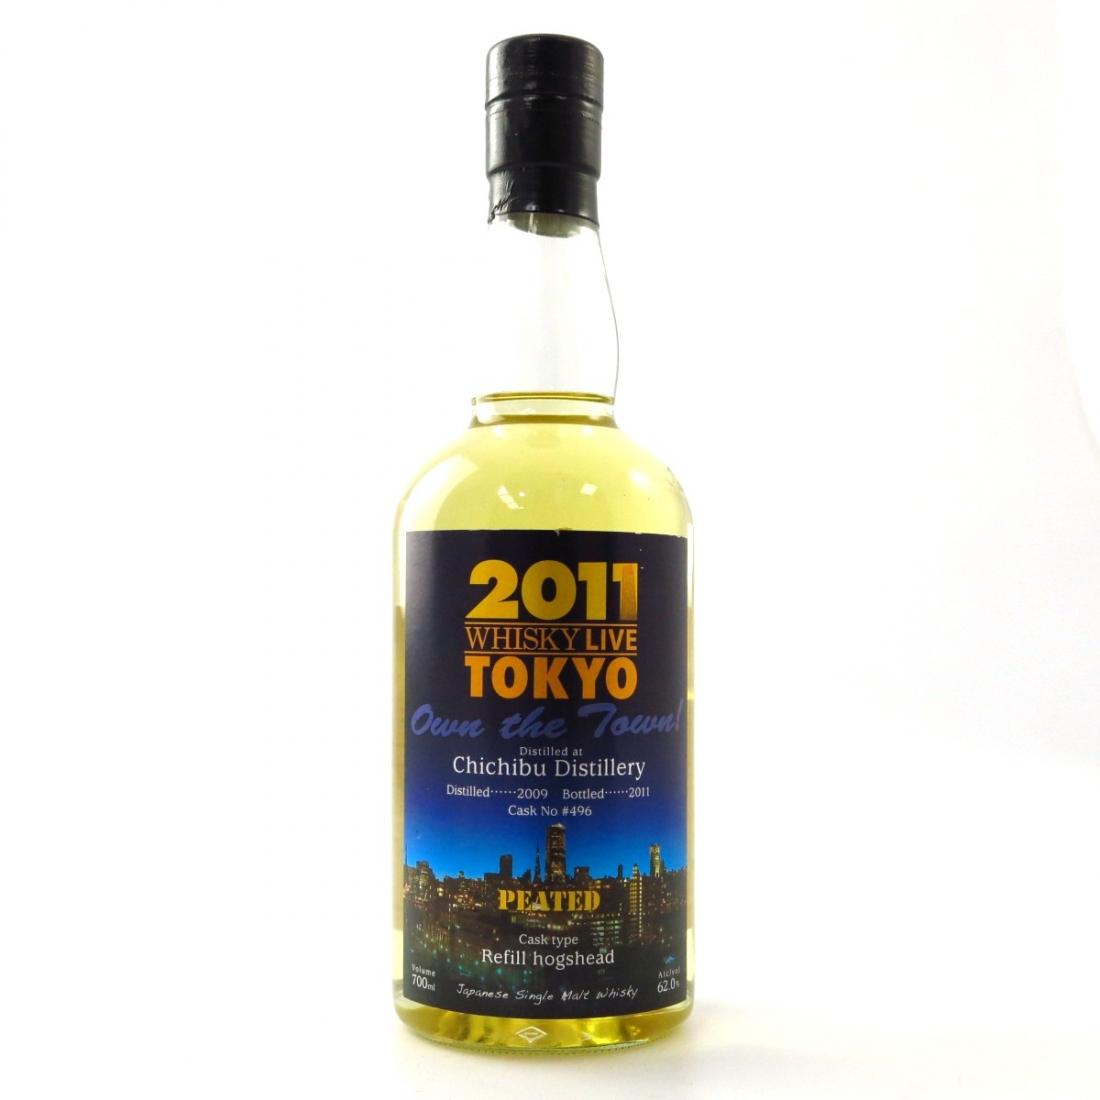 Chichibu 2008 Ichiro's Malt Single Cask #496 / Whisky Live Tokyo 2011